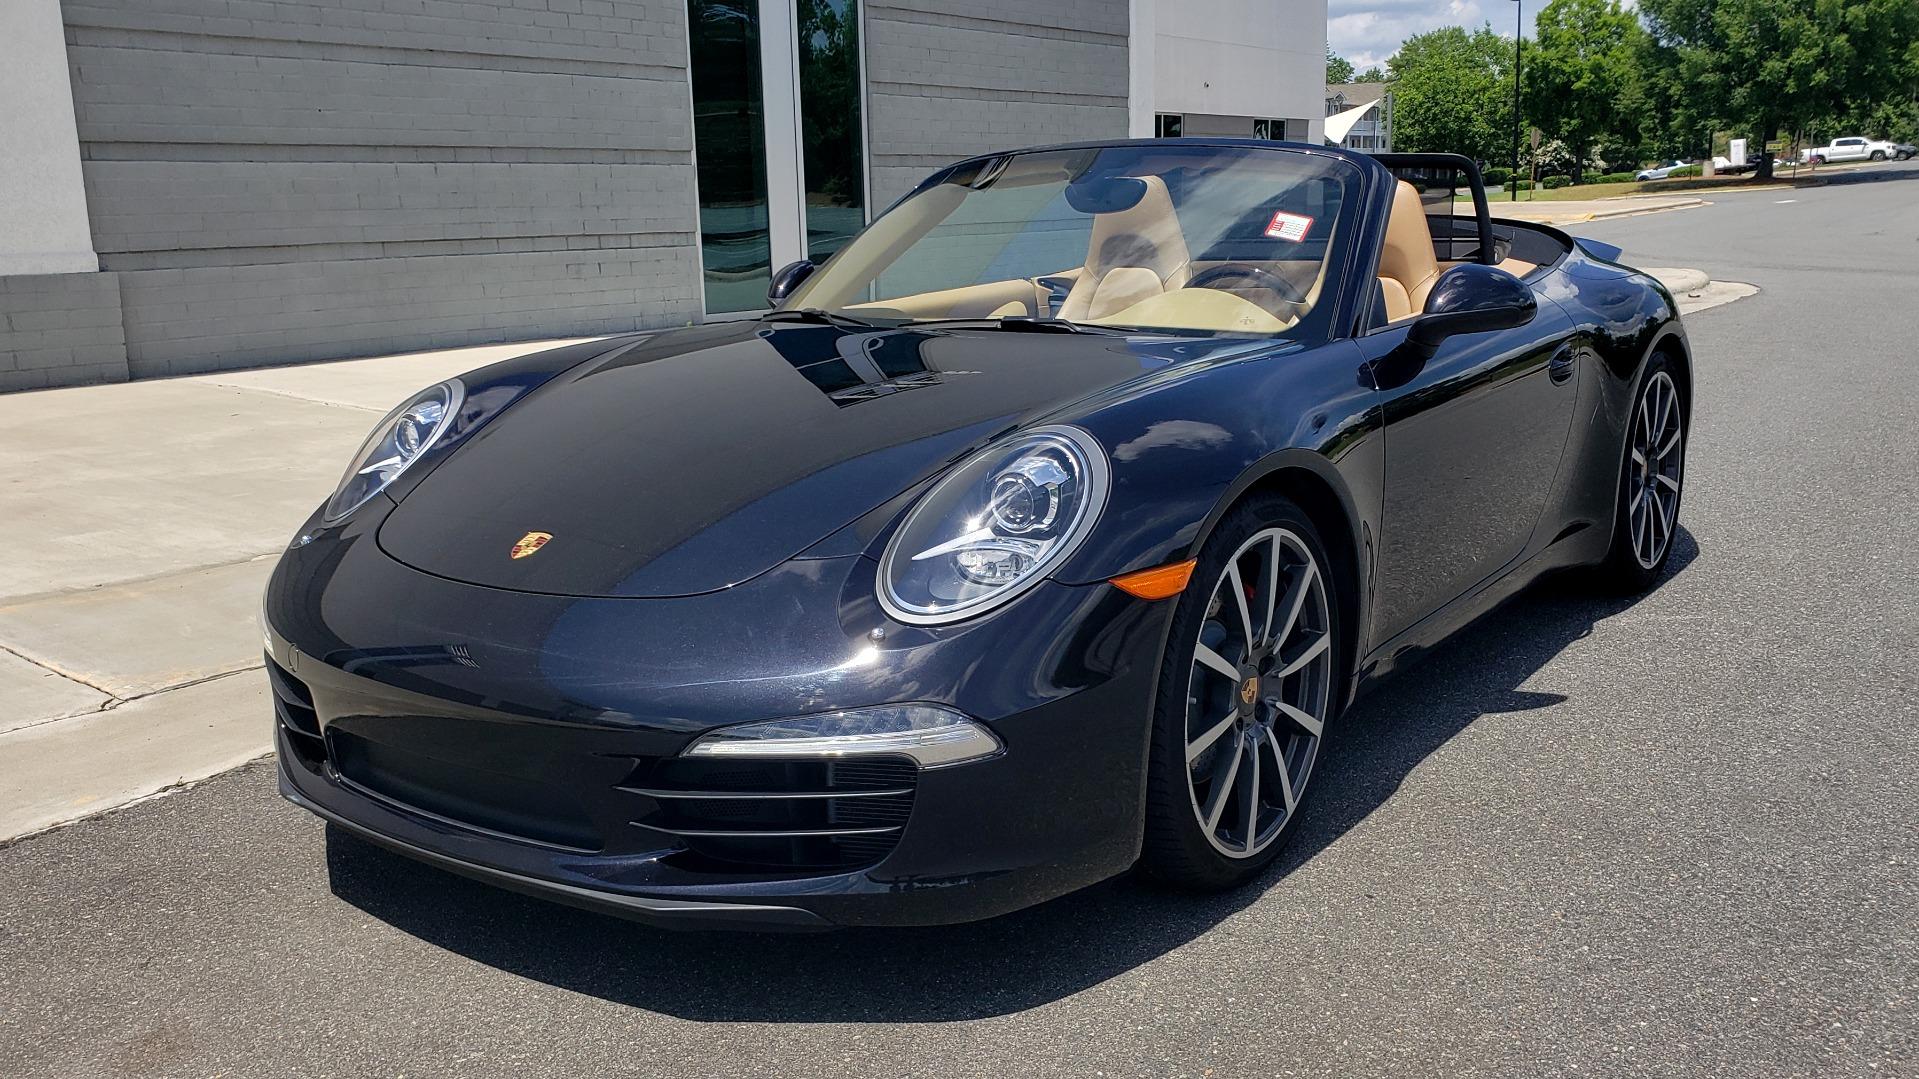 Used 2014 Porsche 911 CARRERA S CABRIOLET / PREM PKG / PDK / NAV / BOSE / SPORT CHRONO for sale $81,995 at Formula Imports in Charlotte NC 28227 2